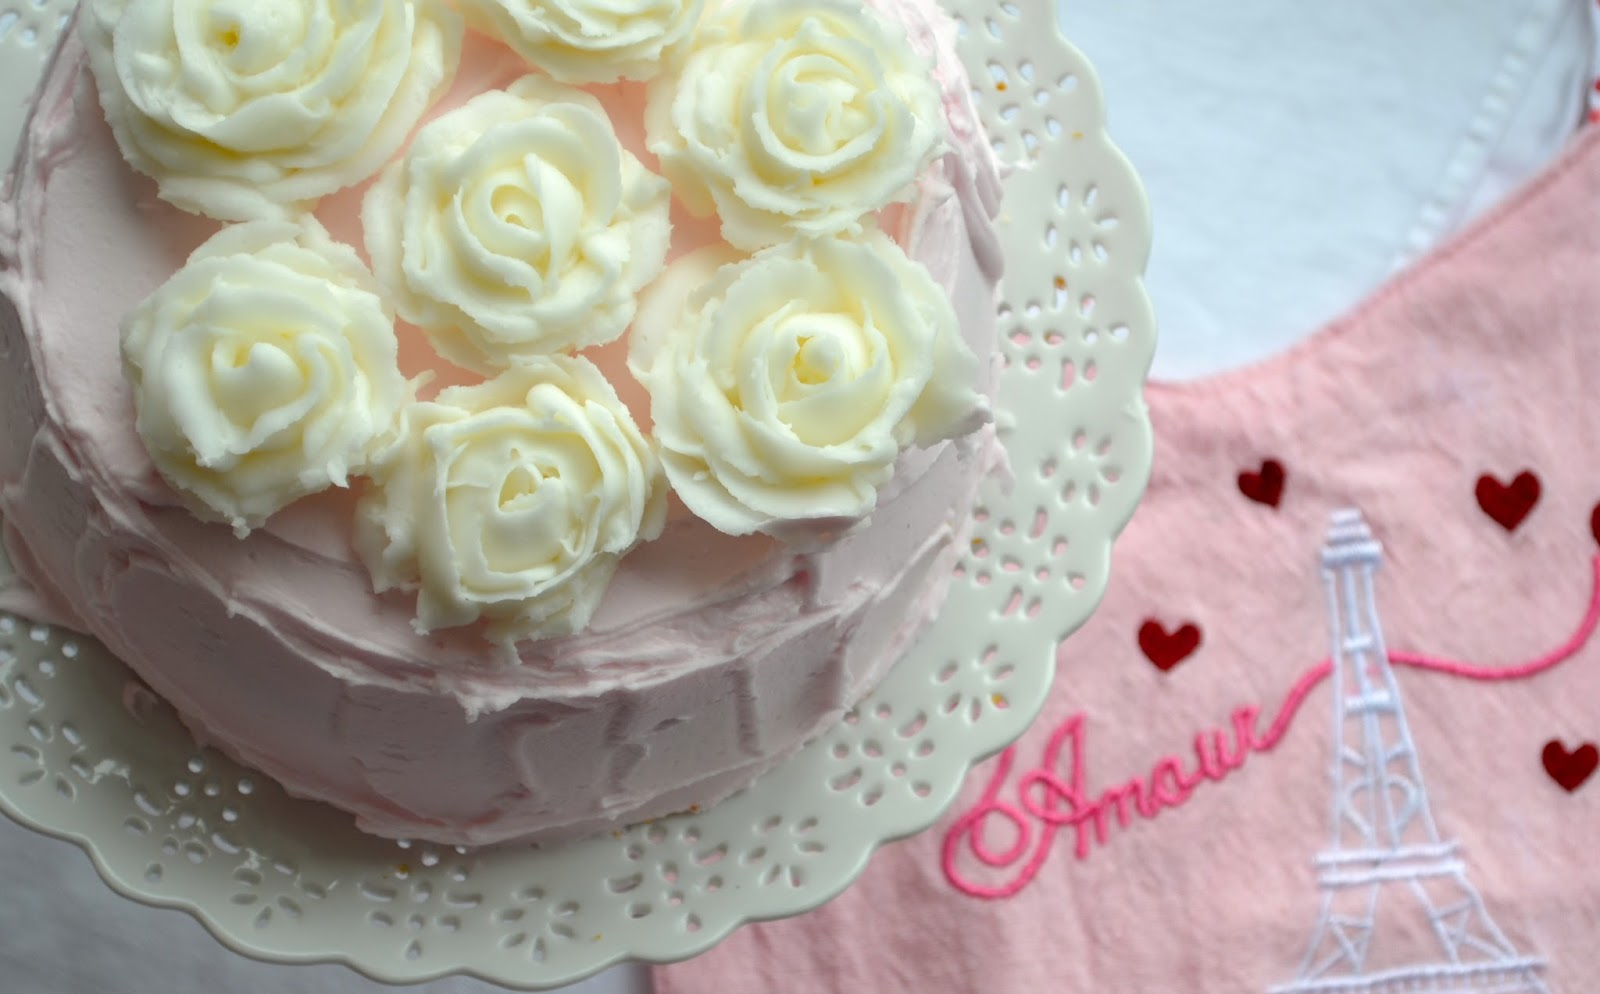 buttercream roses valentine's day